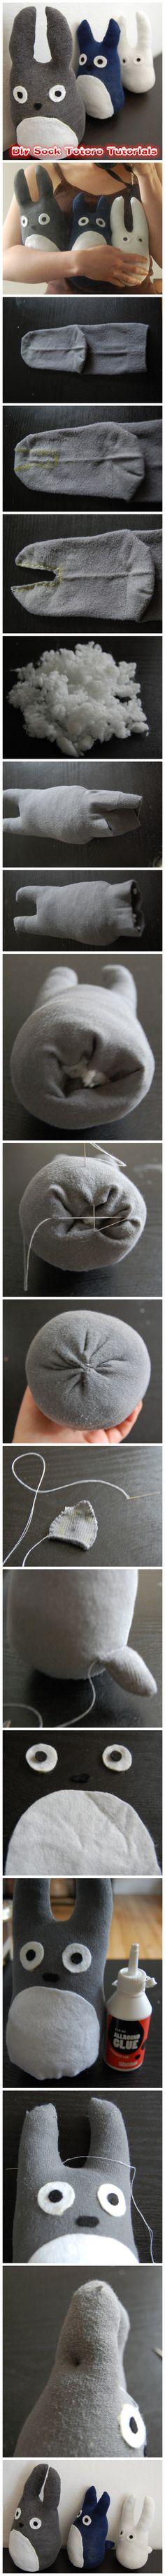 Diy Sock Totoro Tutorials